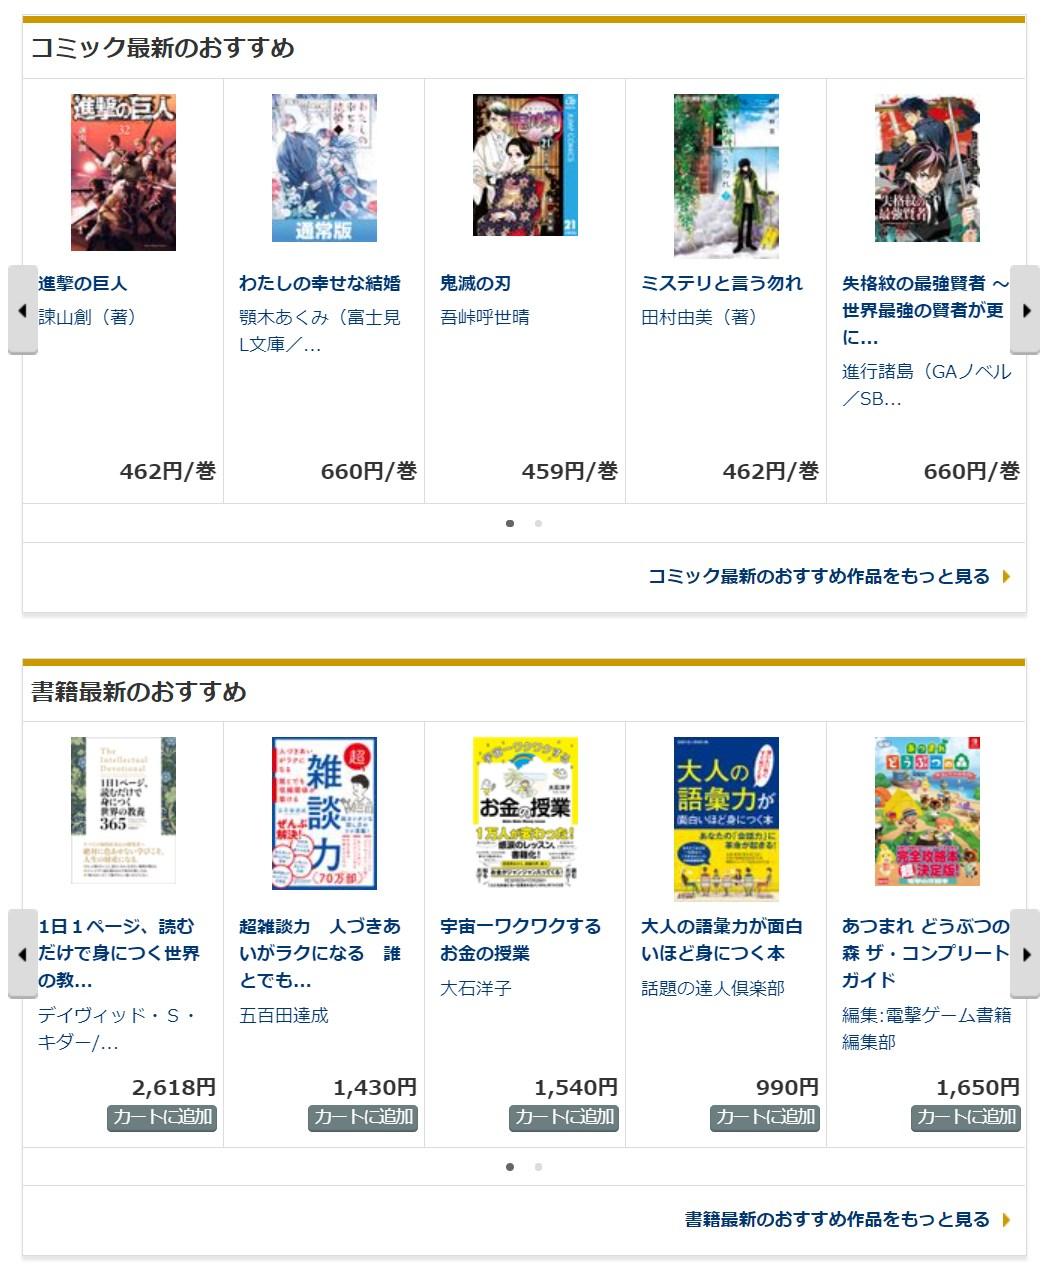 music.jpの電子書籍